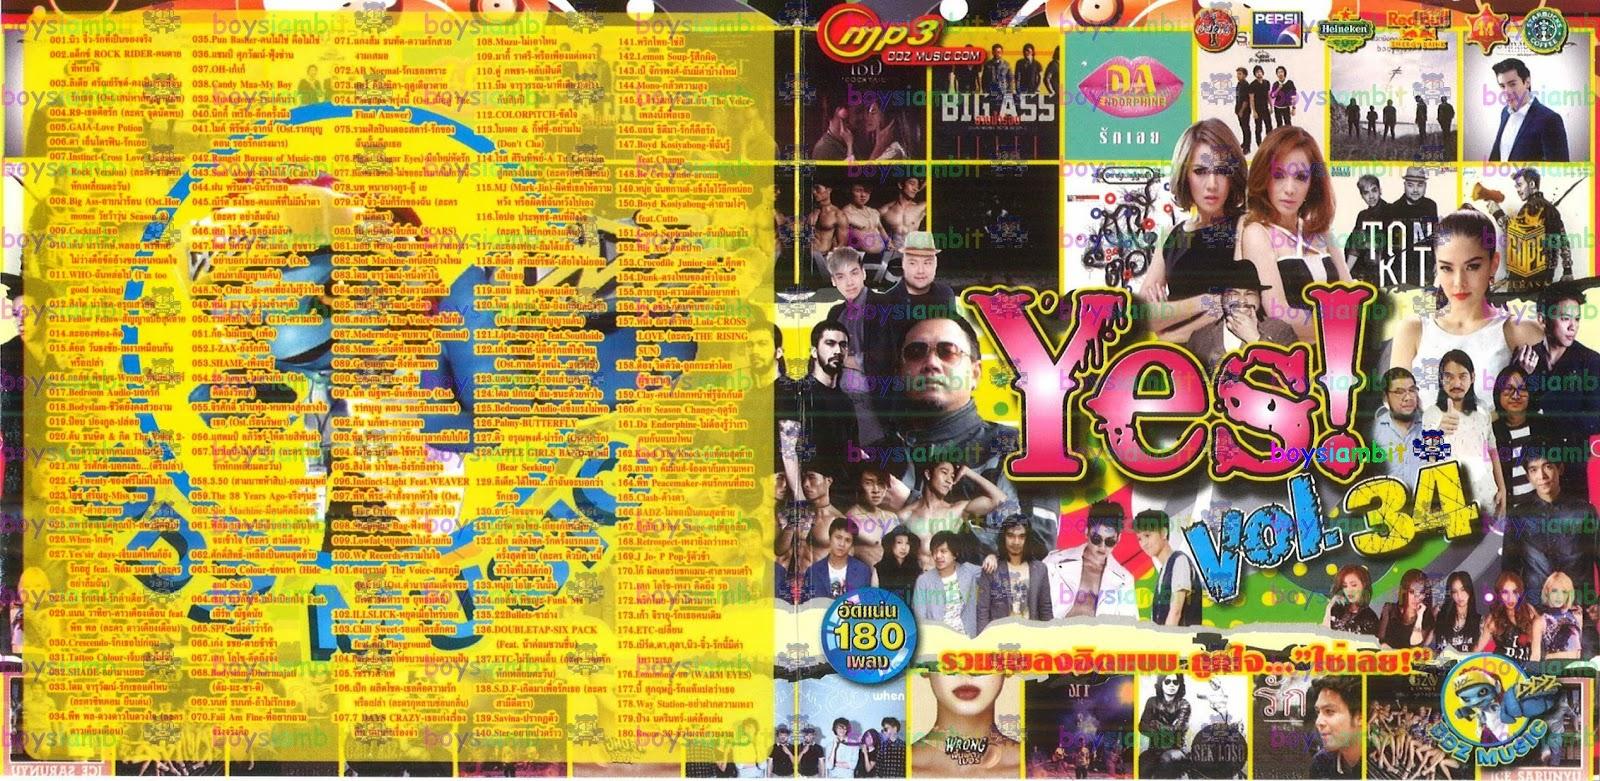 "Download [Mp3]-[Hot New] รวมเพลงฮิตแบบ ถูกใจ….""ใช่เลย""! ในชุด YES! Vol.34 อัดแน่น 180 เพลง [Solidfiles] 4shared By Pleng-mun.com"